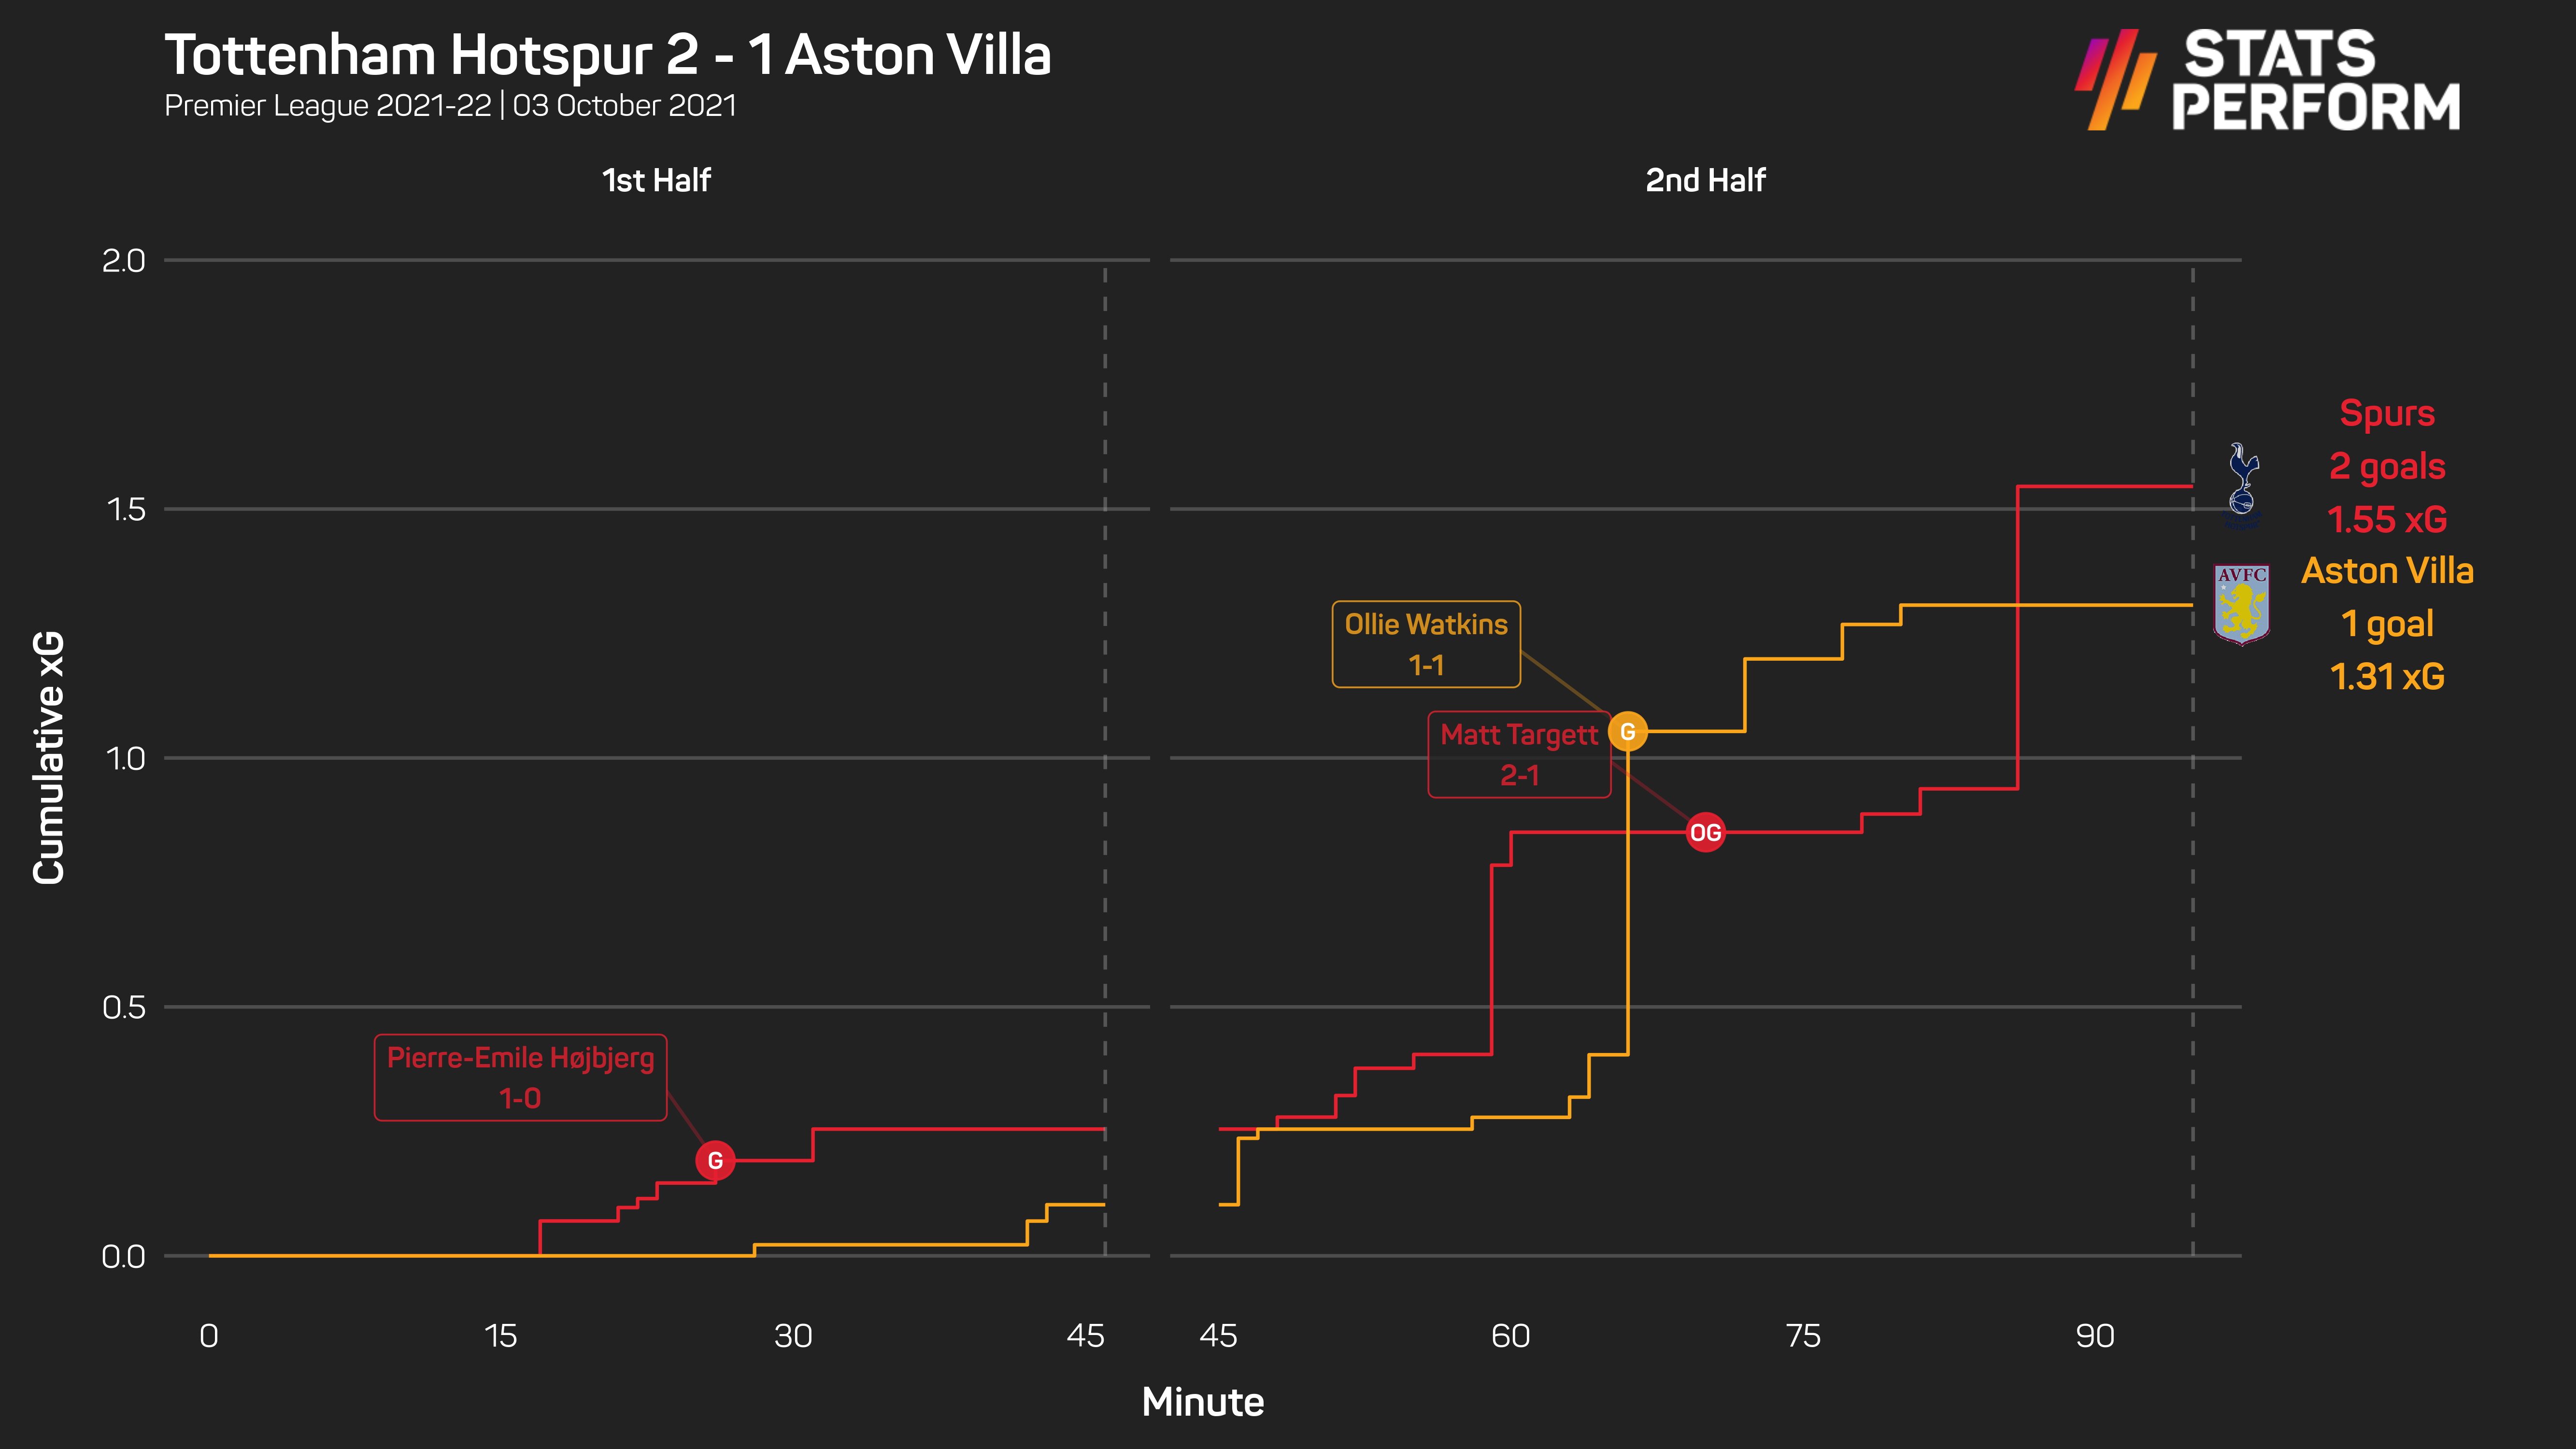 Spurs edged out Aston Villa on Sunday